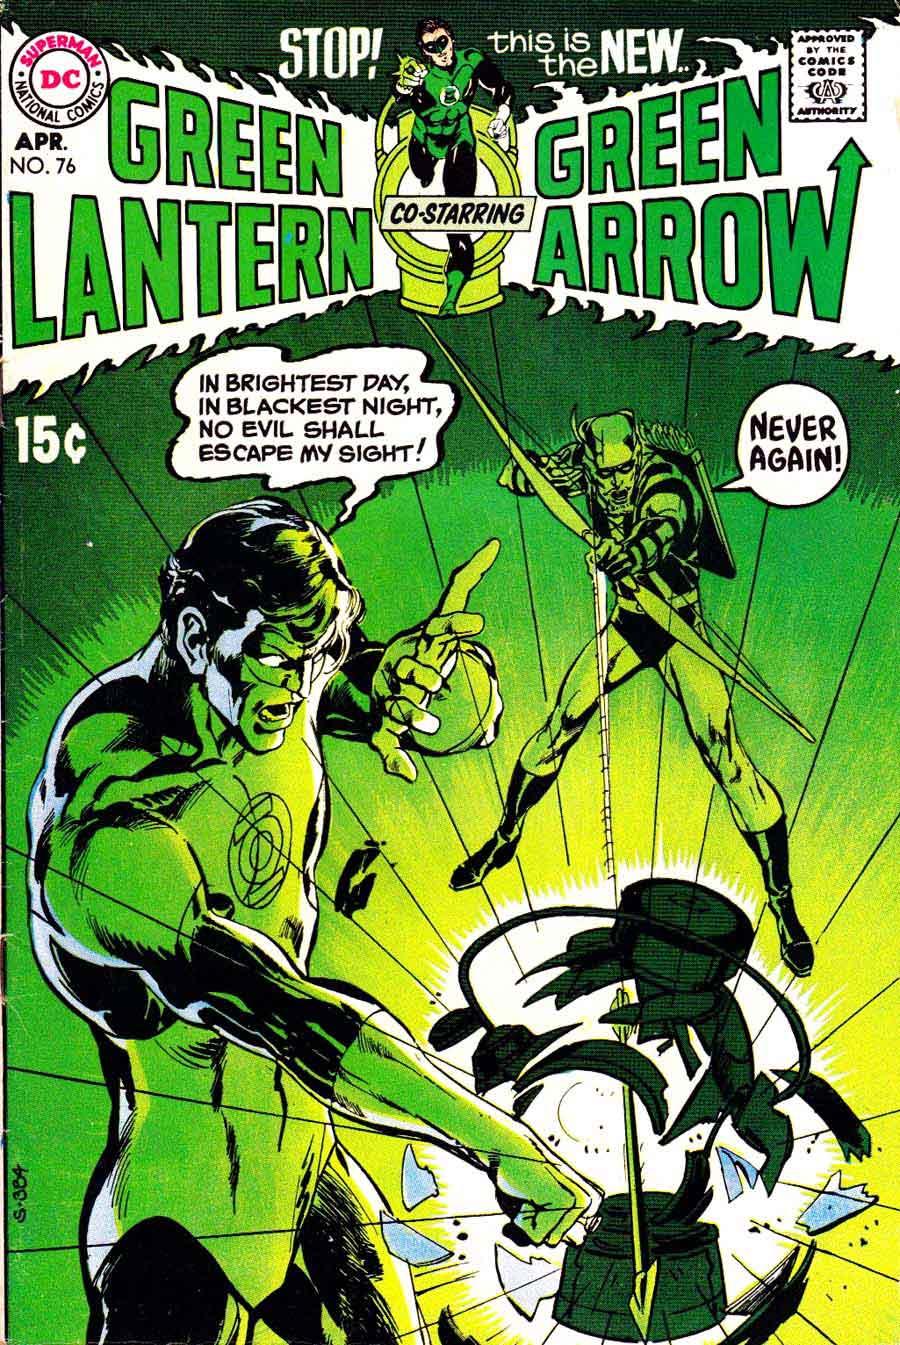 Comic Book Cover Art : Green lantern v neal adams art cover pencil ink